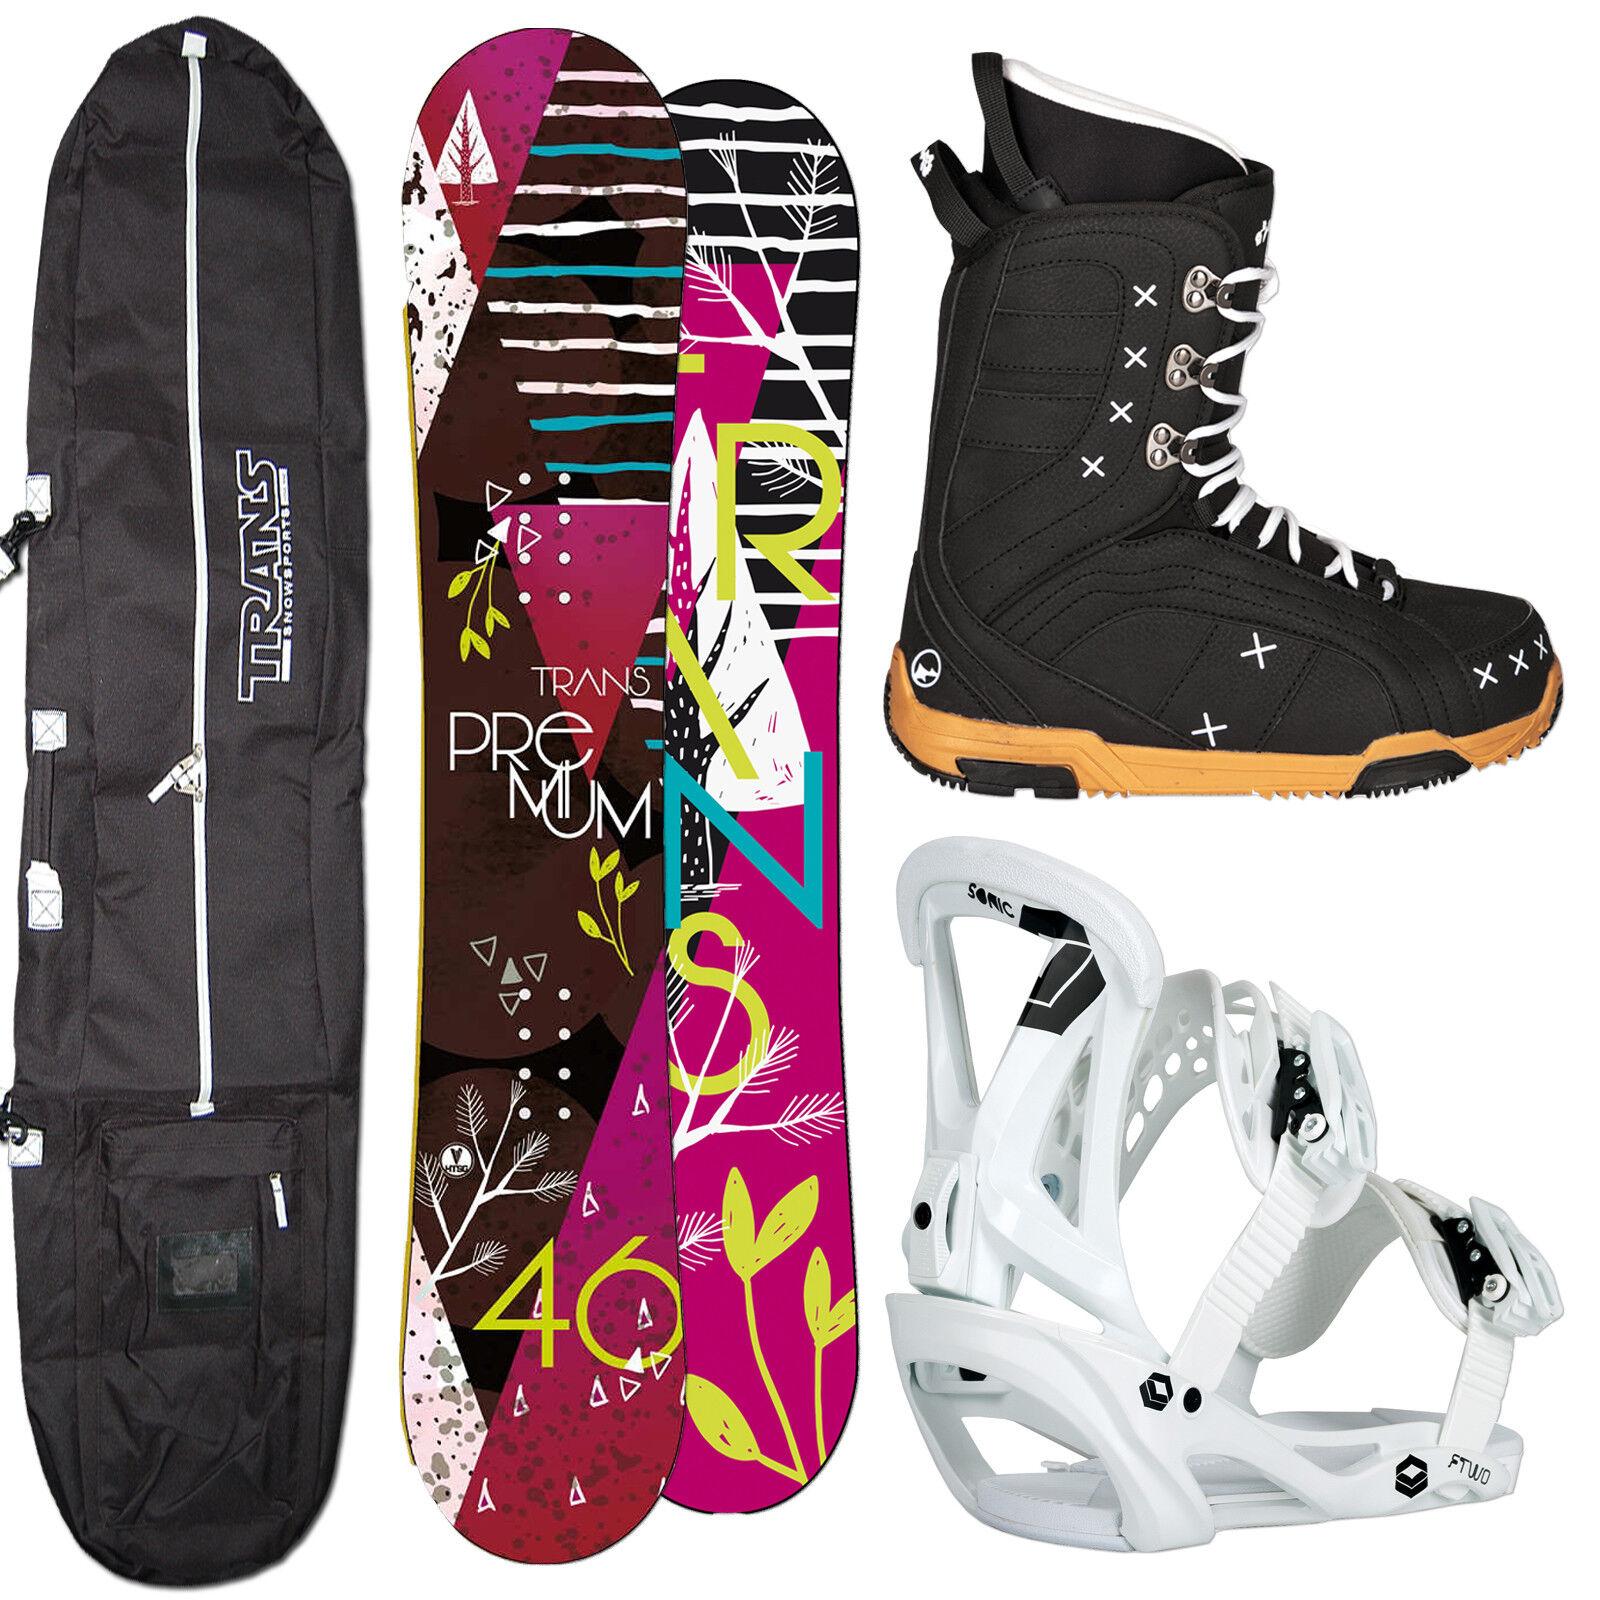 DAMEN SNOWBOARD TRANS PREMIUM 152 CM BERRY + SONIC BINDUNG GR. M + BOOTS + BAG